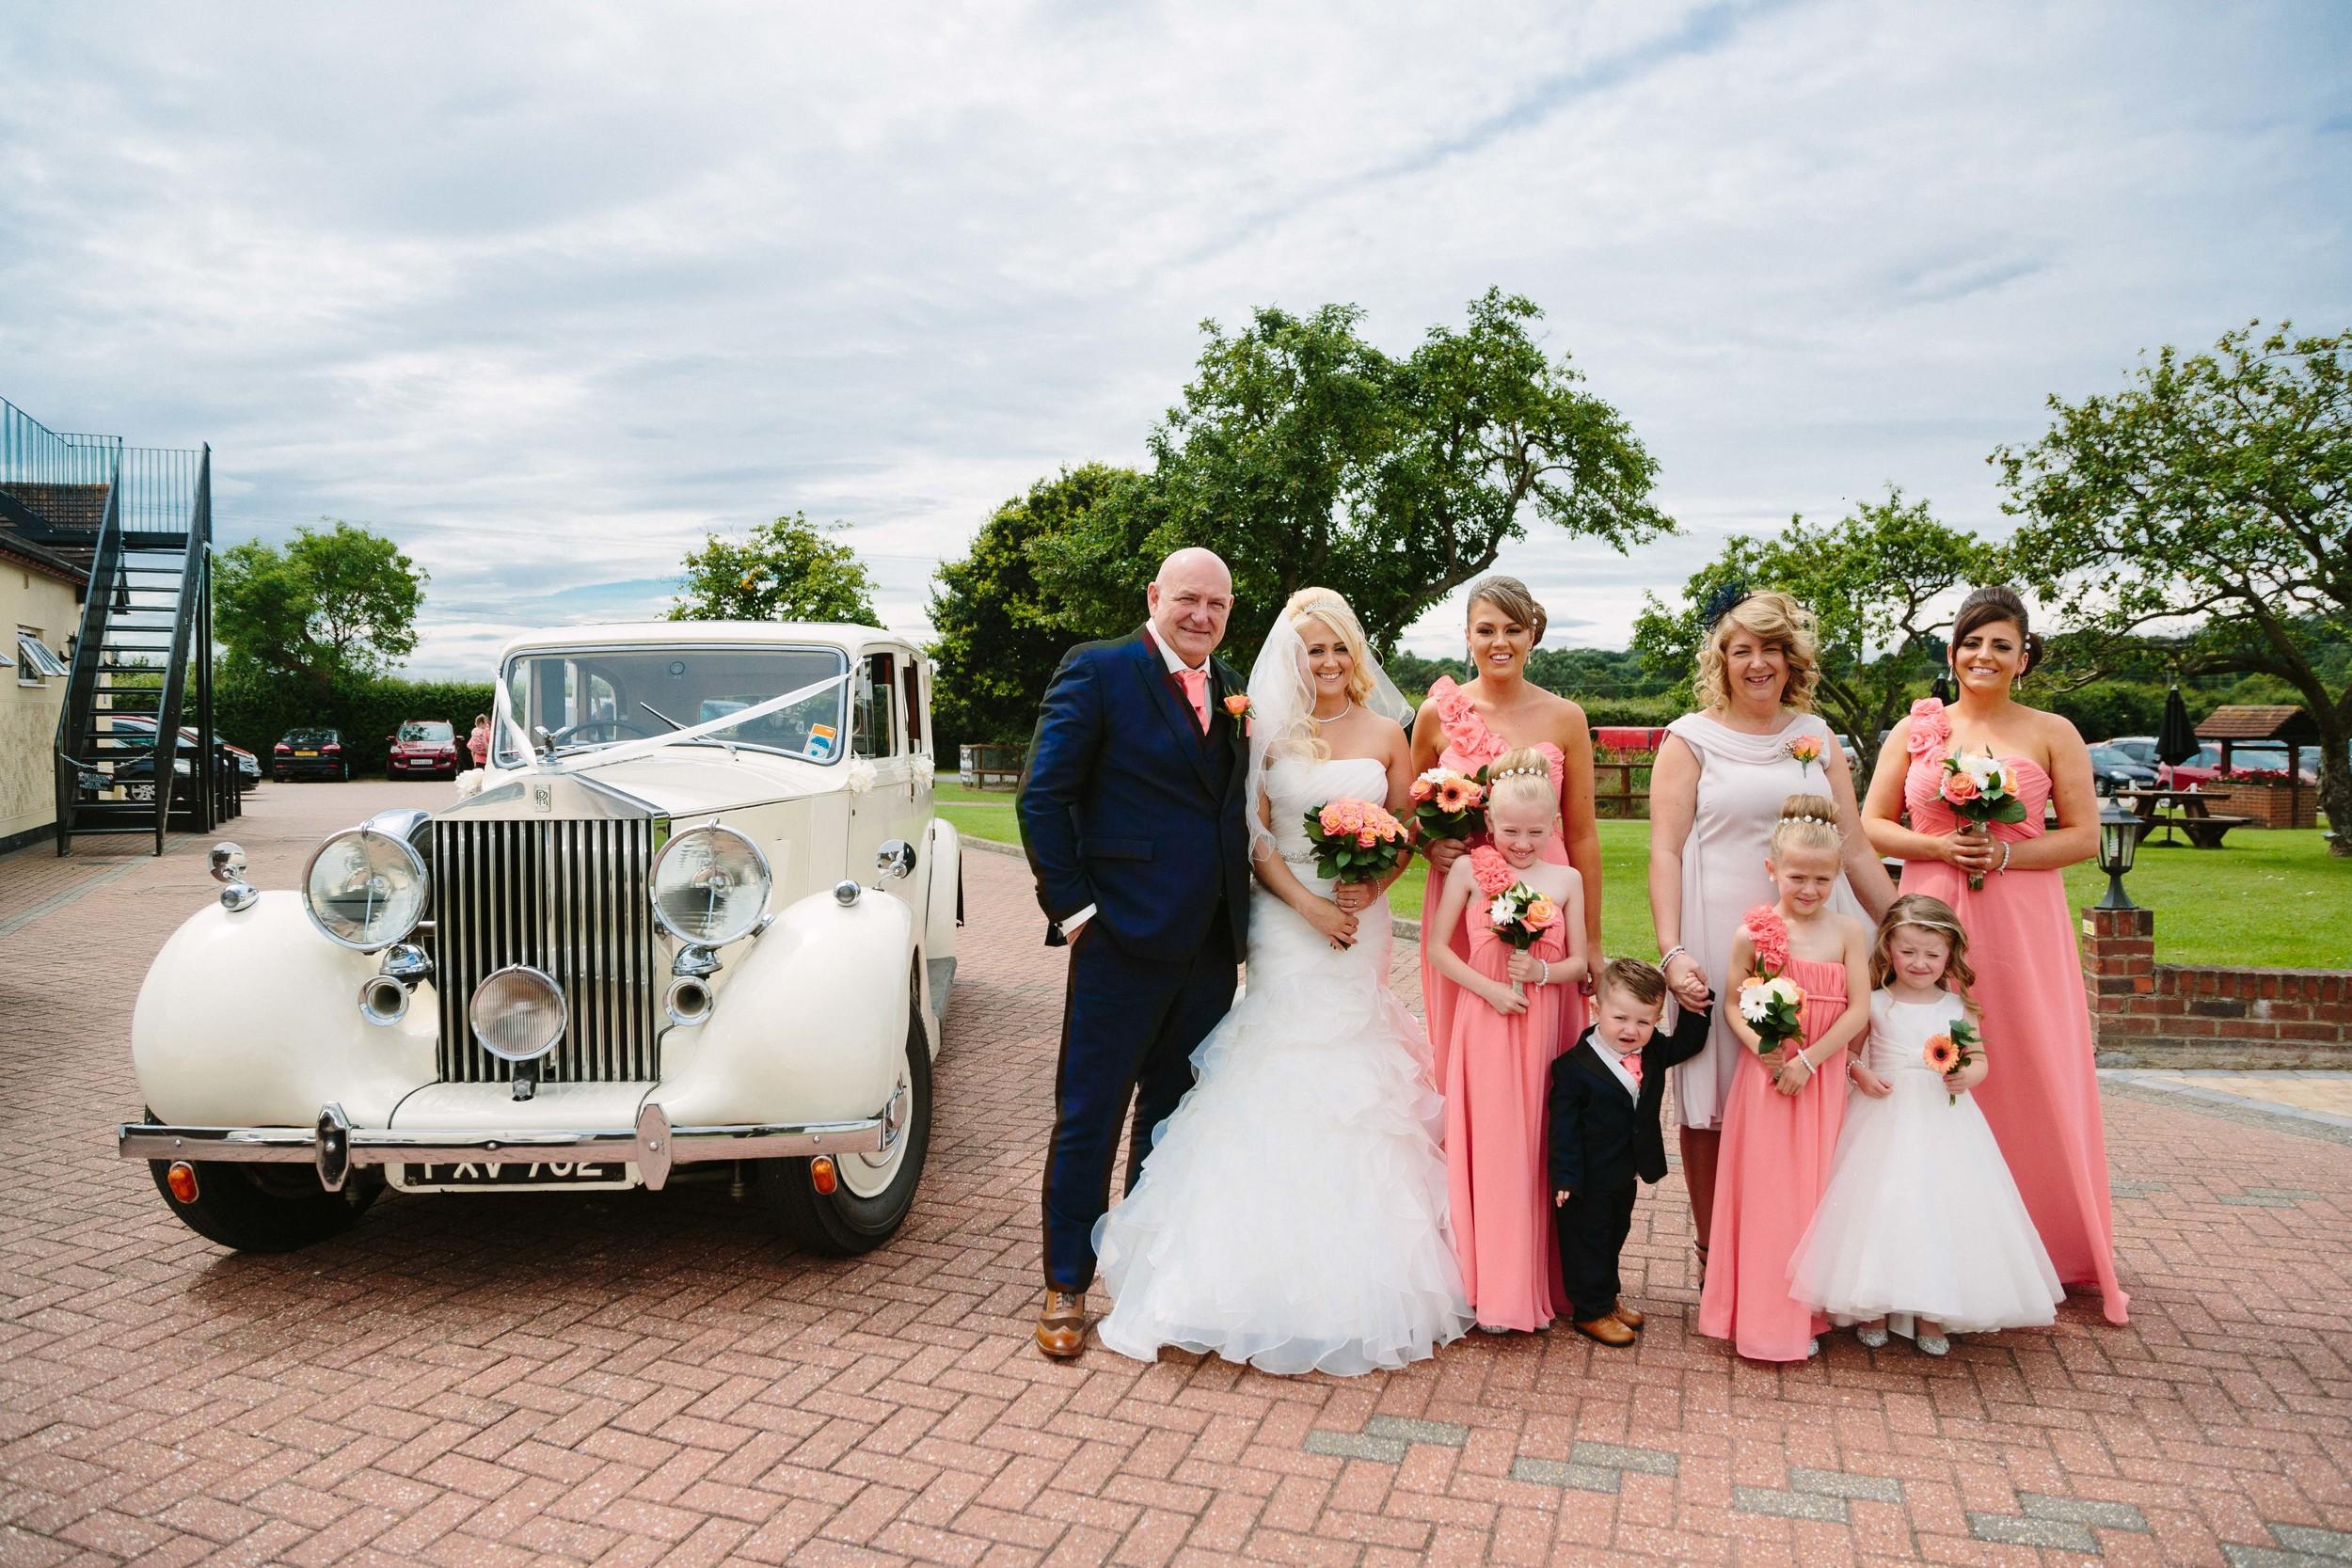 Essex-countryside-wedding-summer-bridesmaids